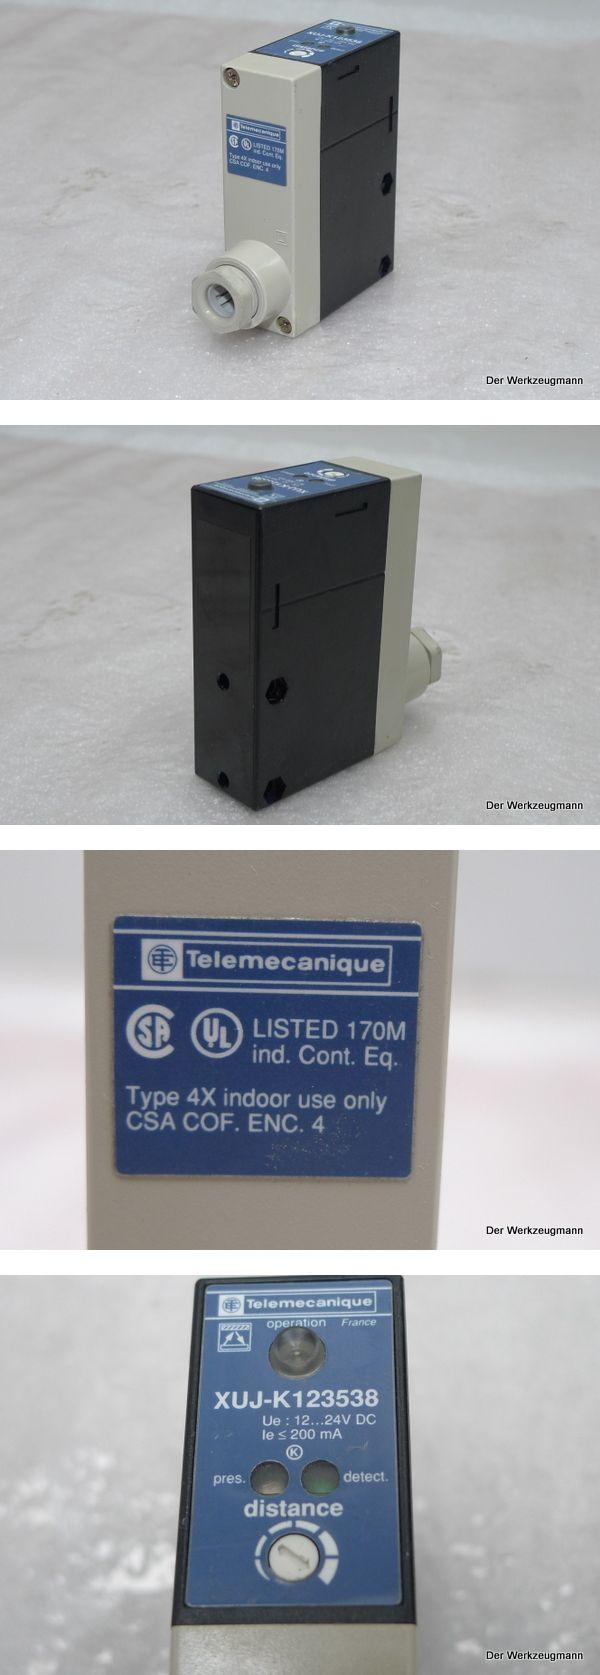 Telemecanique XUJ-K123538